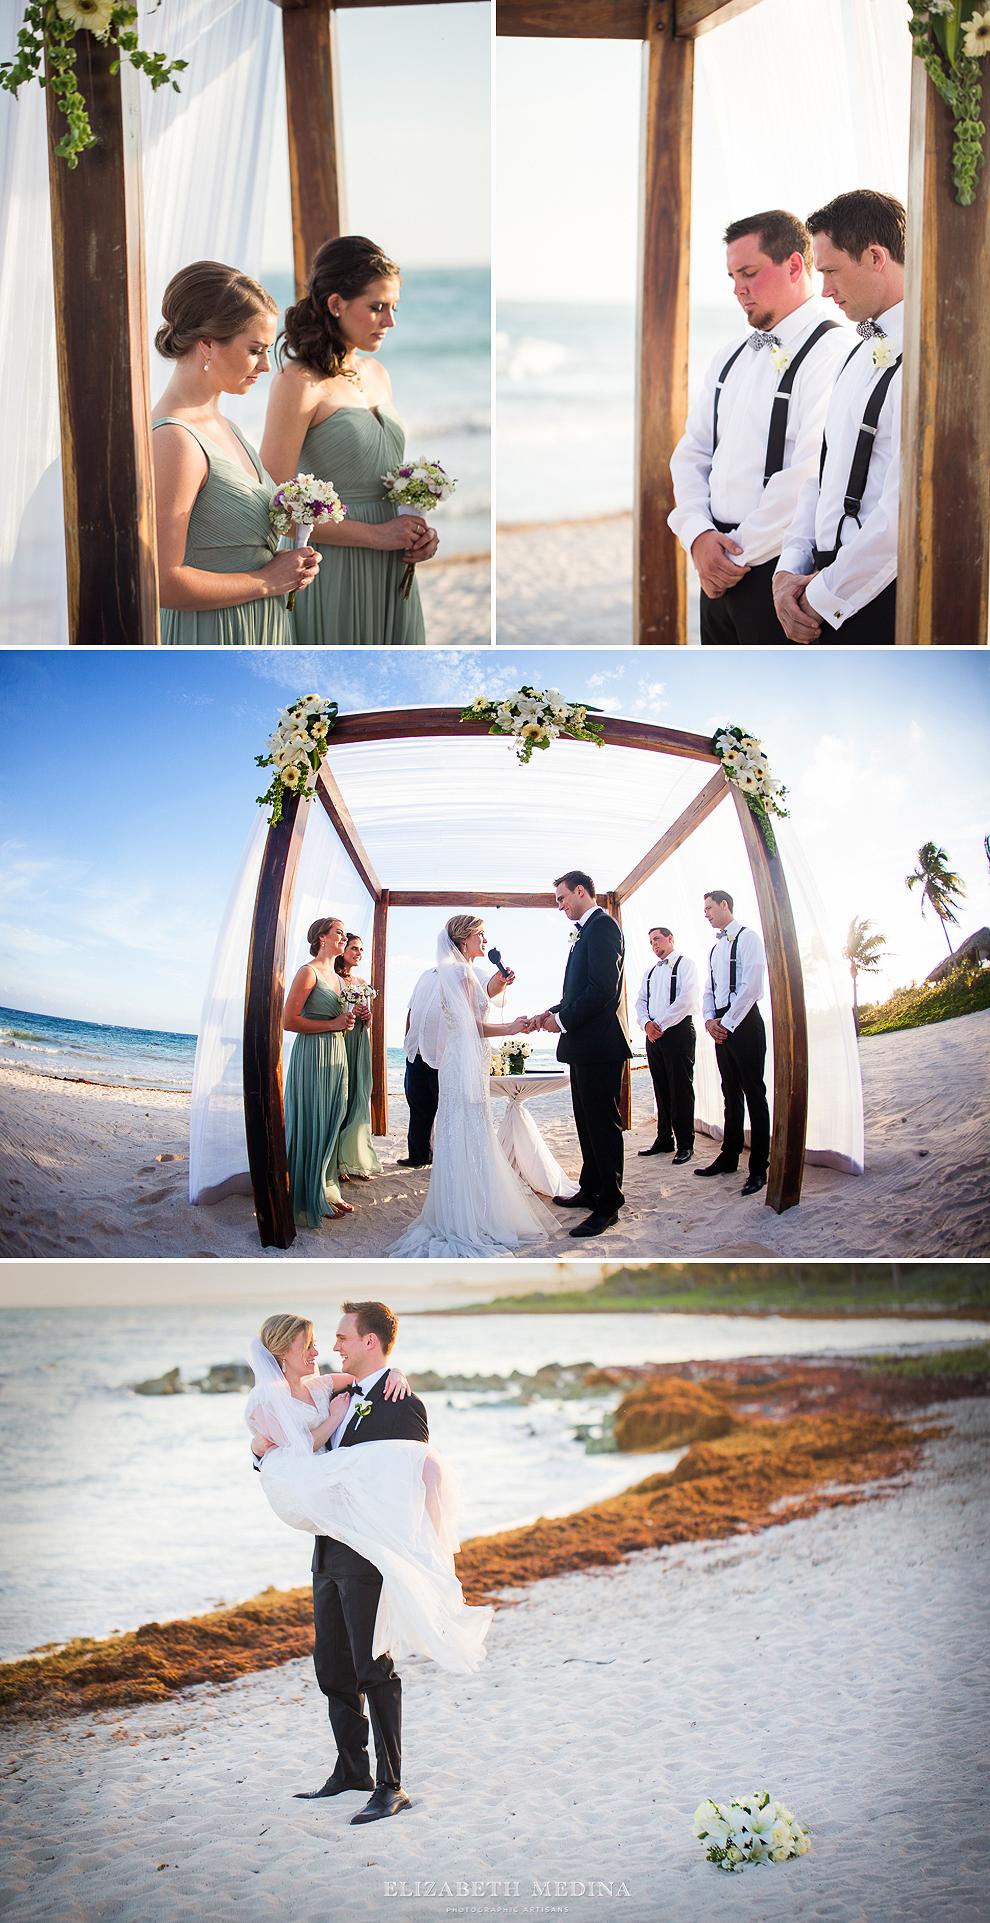 tulum_wedding_029 Dreams Tulum Wedding, Julie and Matt  01 23 2015